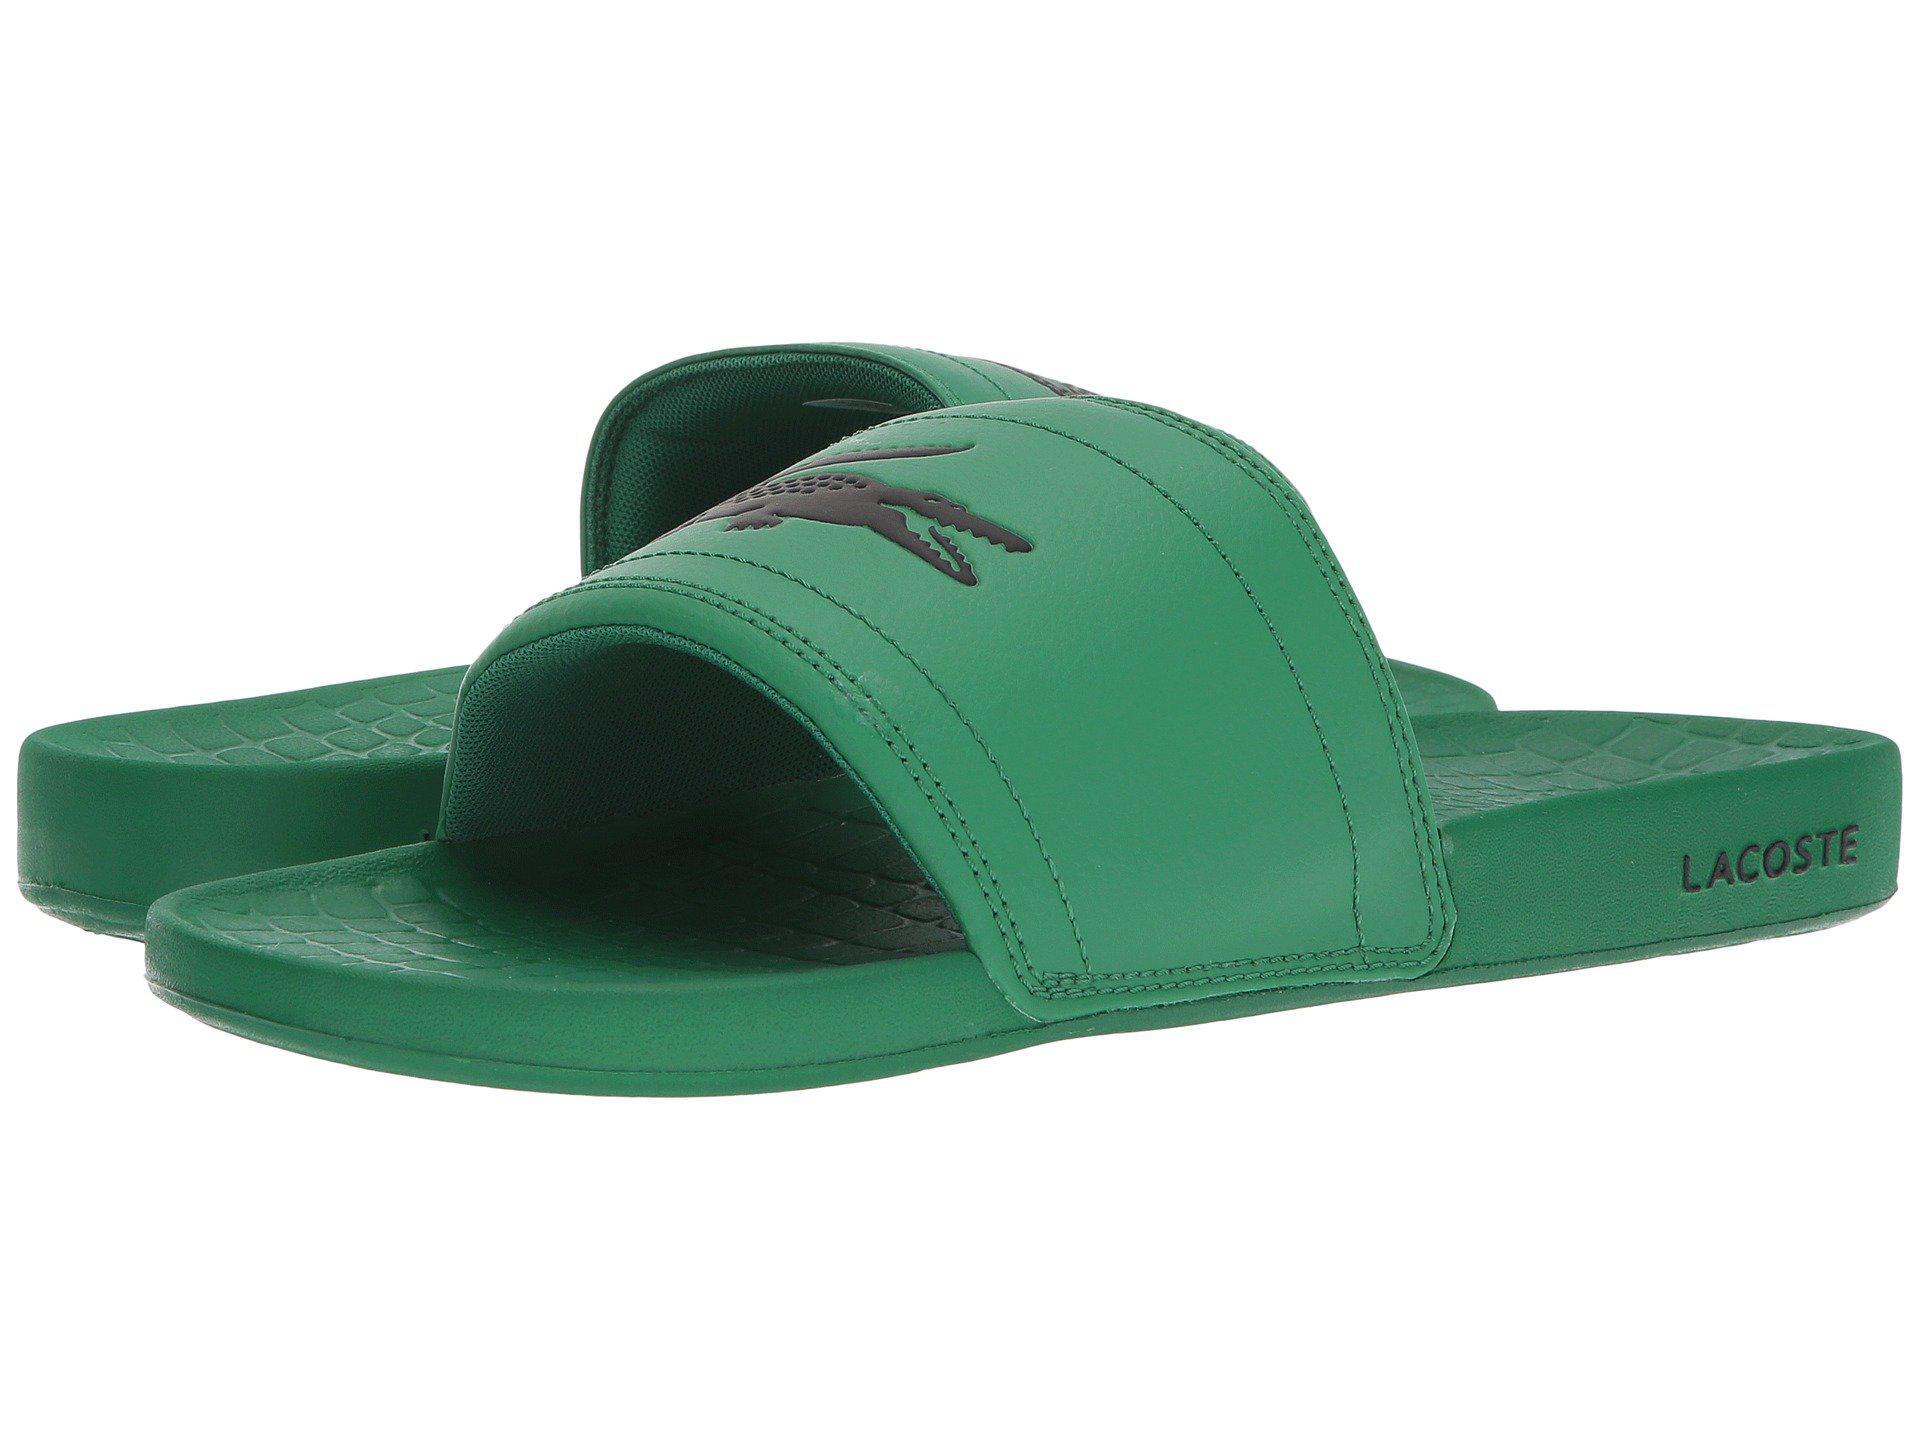 972c180441499 Lyst - Lacoste Fraisier 118 1 Us (green black) Men s Shoes in Green ...